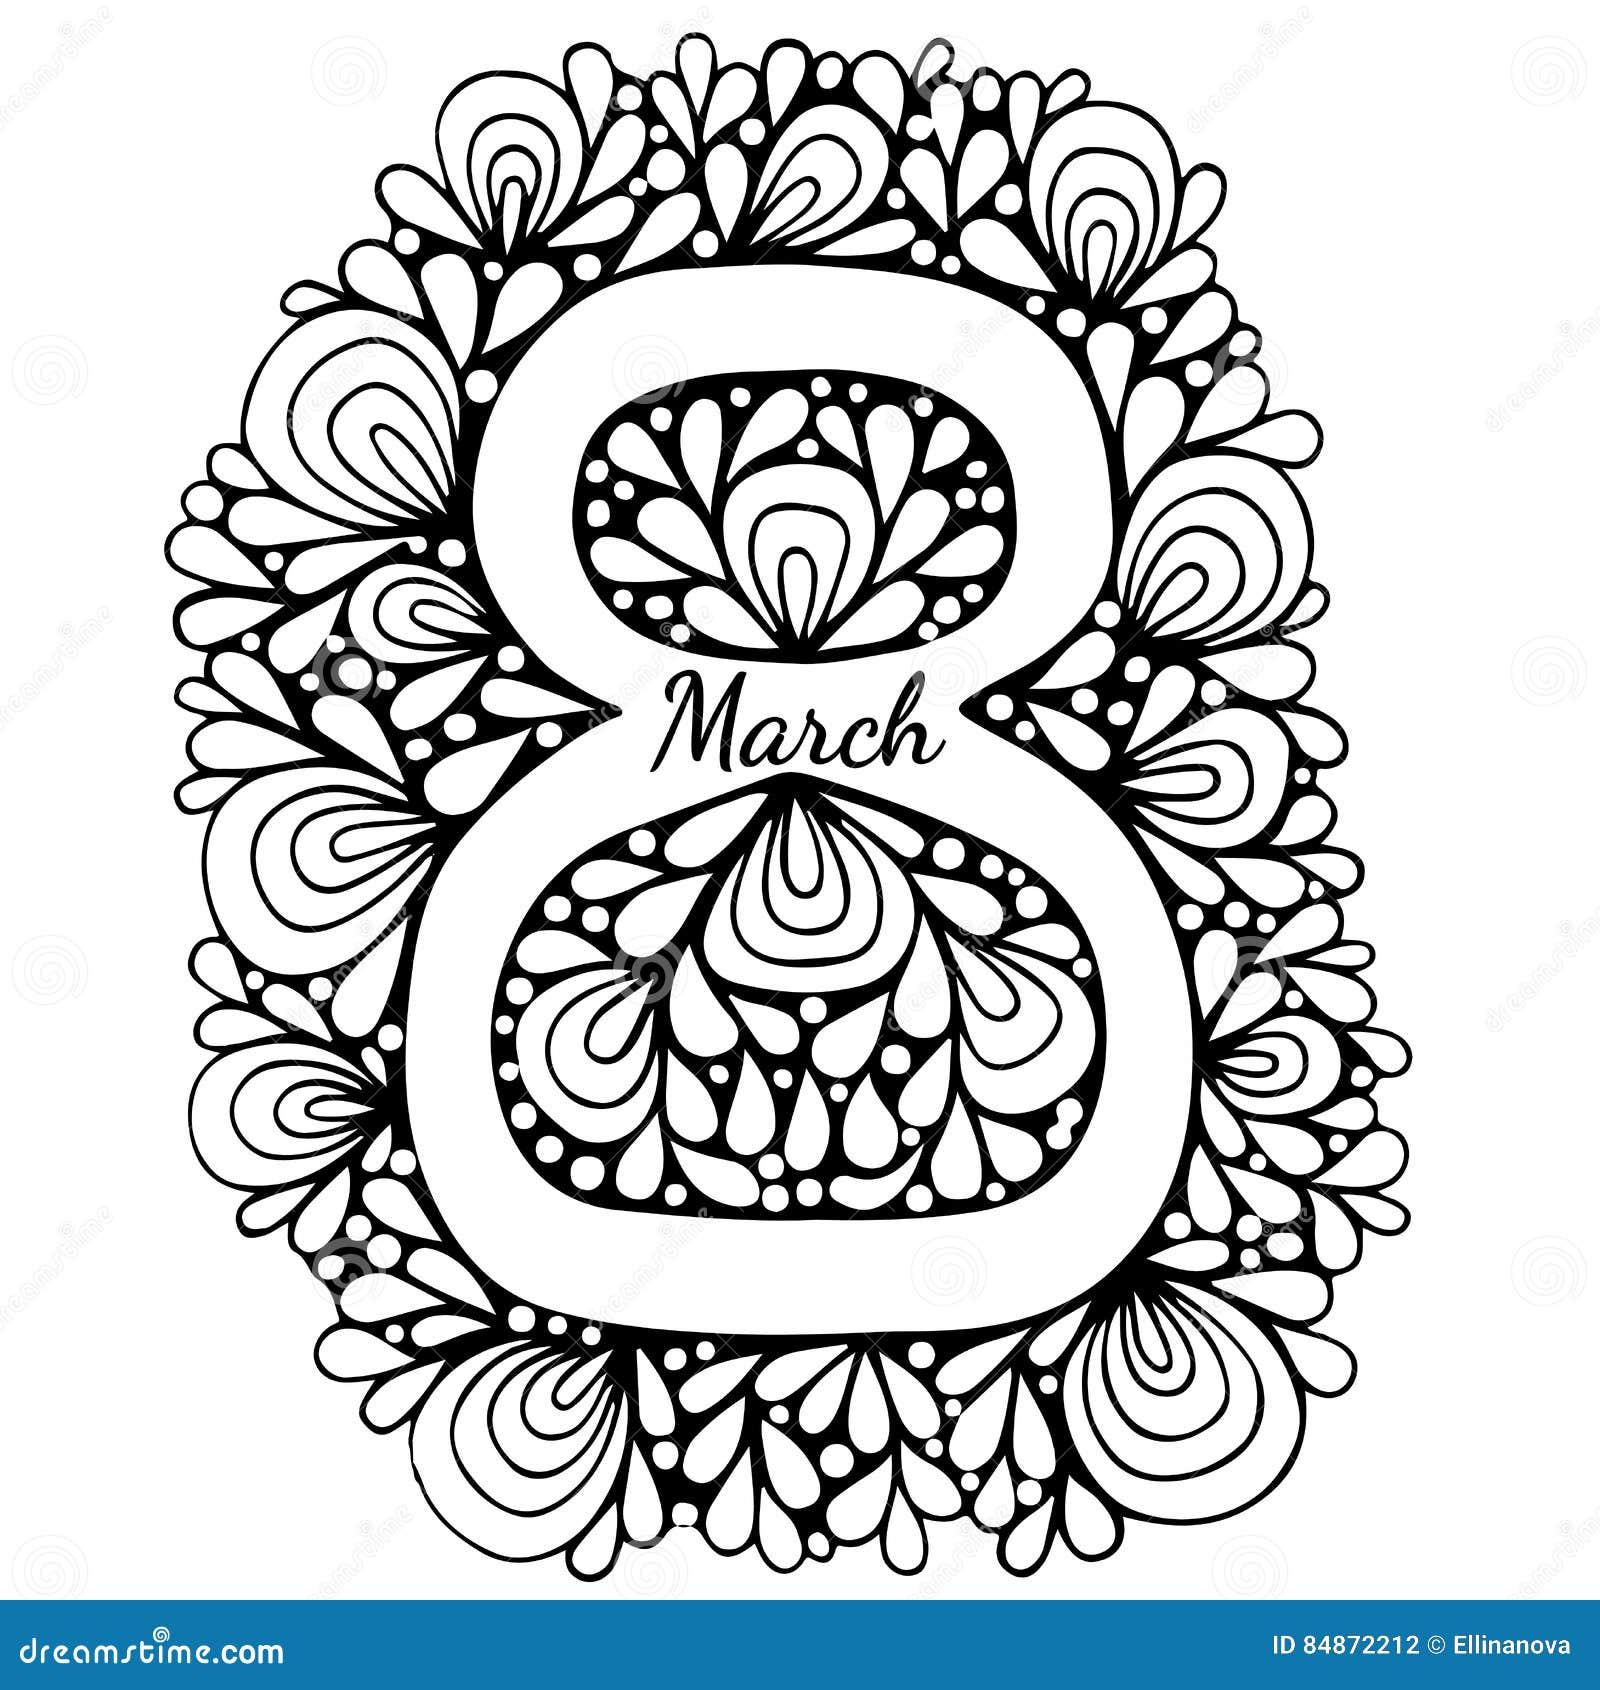 Number Eight In Ornate Frame Stock Vector - Illustration of ...